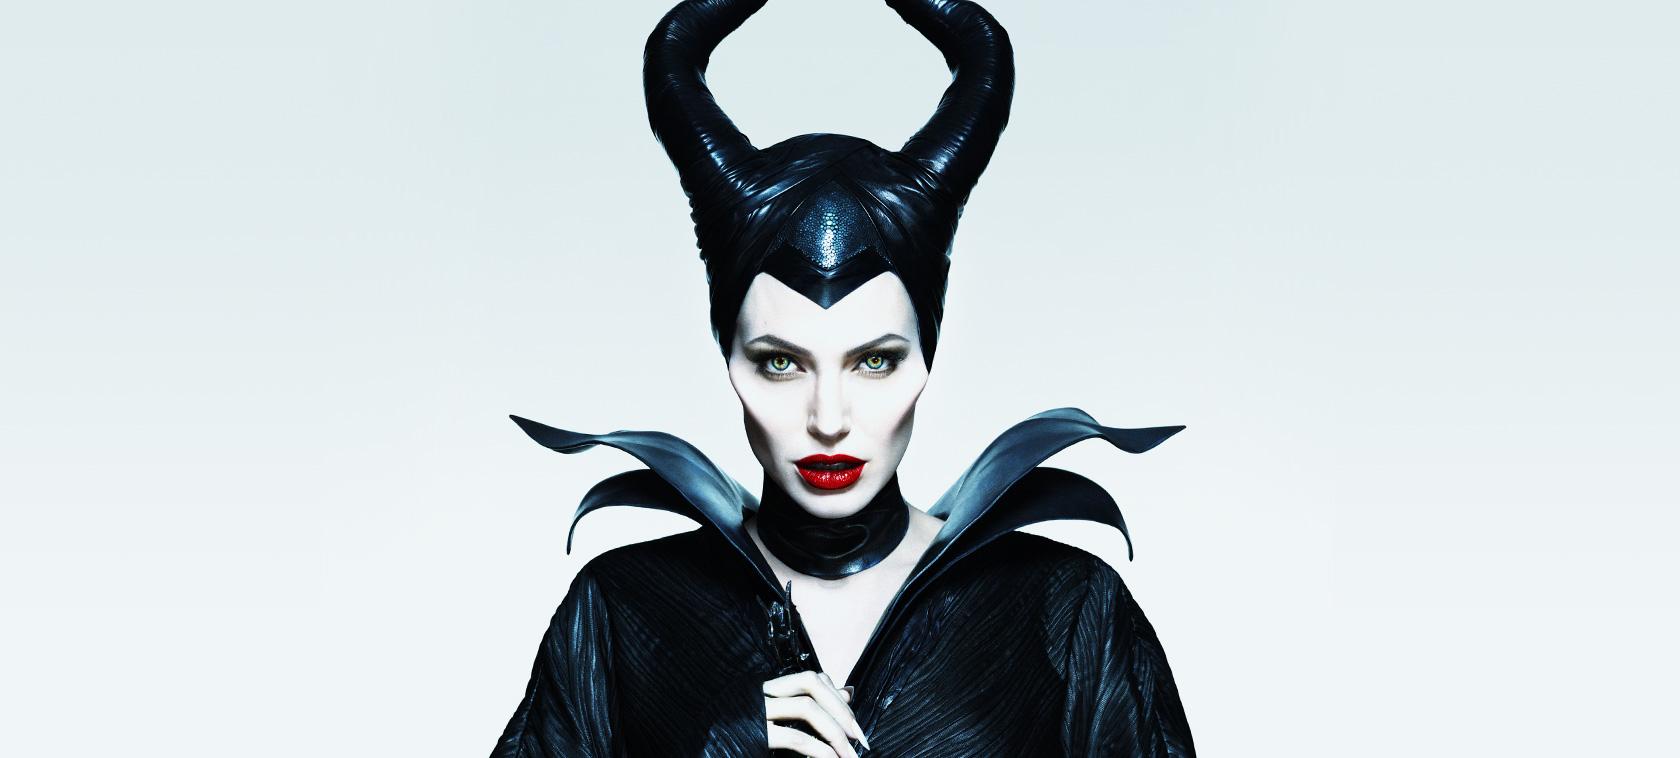 Disney S Maleficent Movie Trailer Twenty4seven Magazine